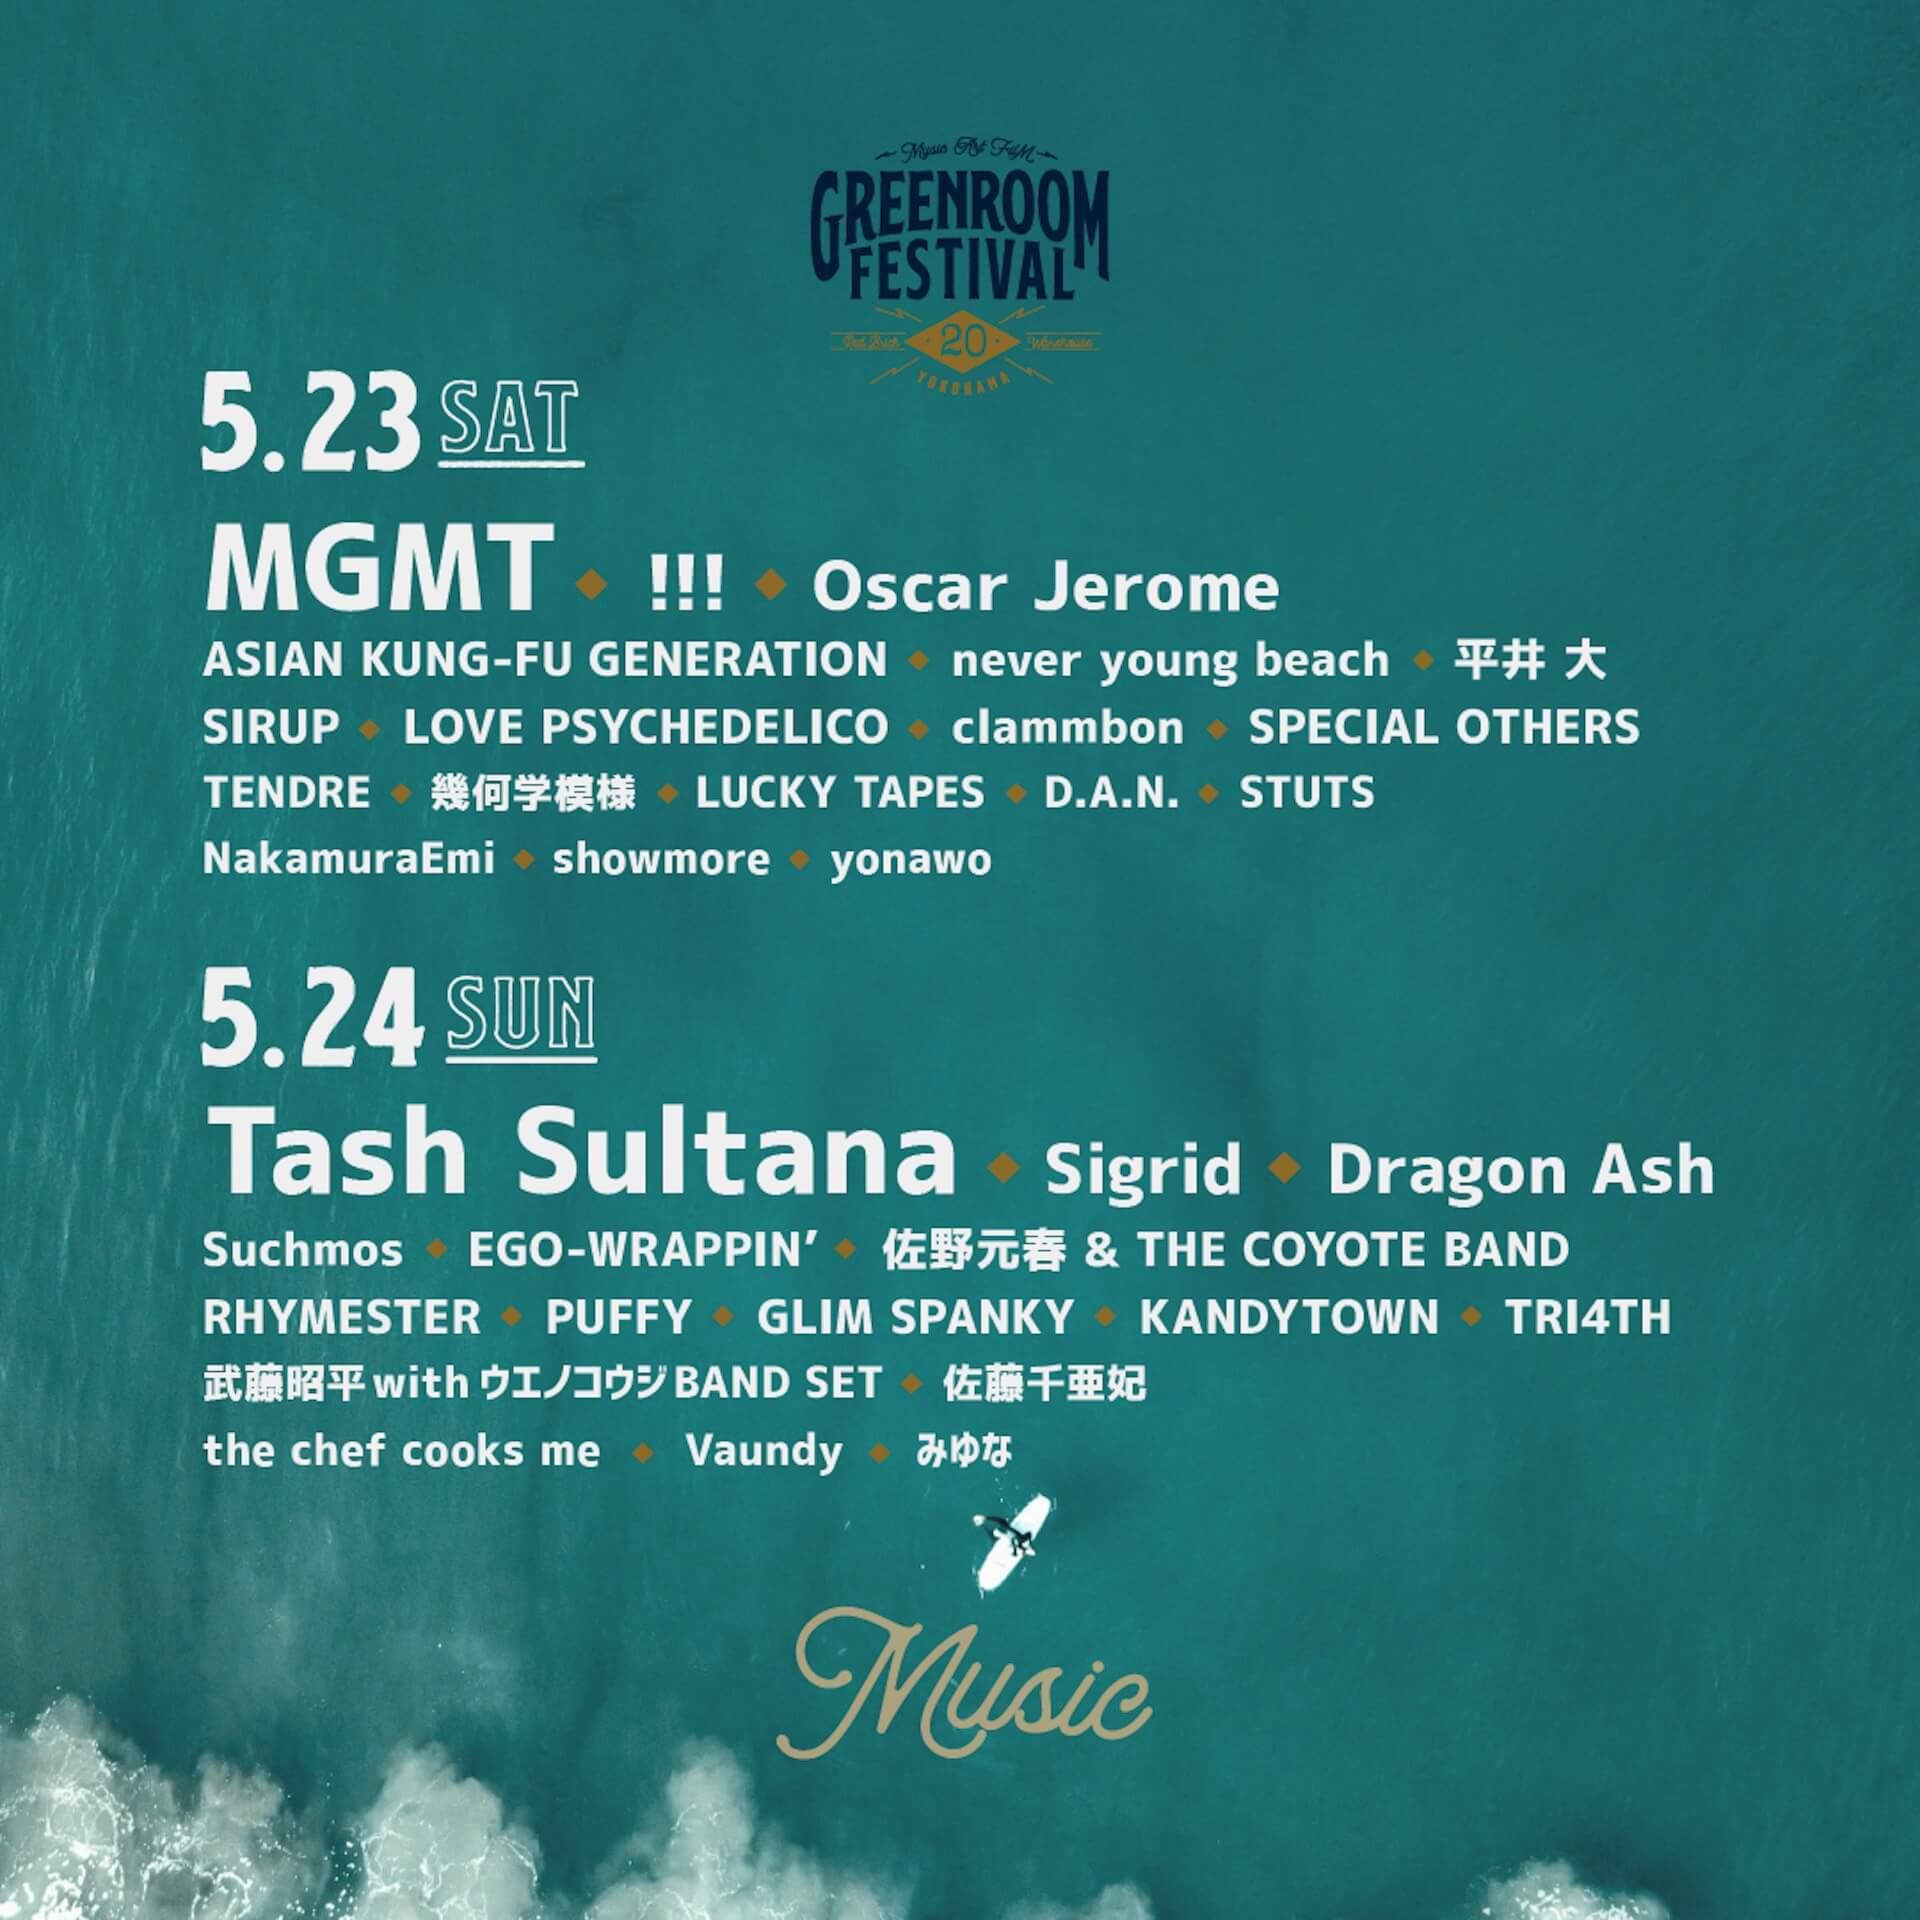 <GREENROOM FESTIVAL'20>第3弾アーティスト&日割り情報発表!Dragon Ash、幾何学模様、KANDYTOWNが登場 music200312_greenroom_15